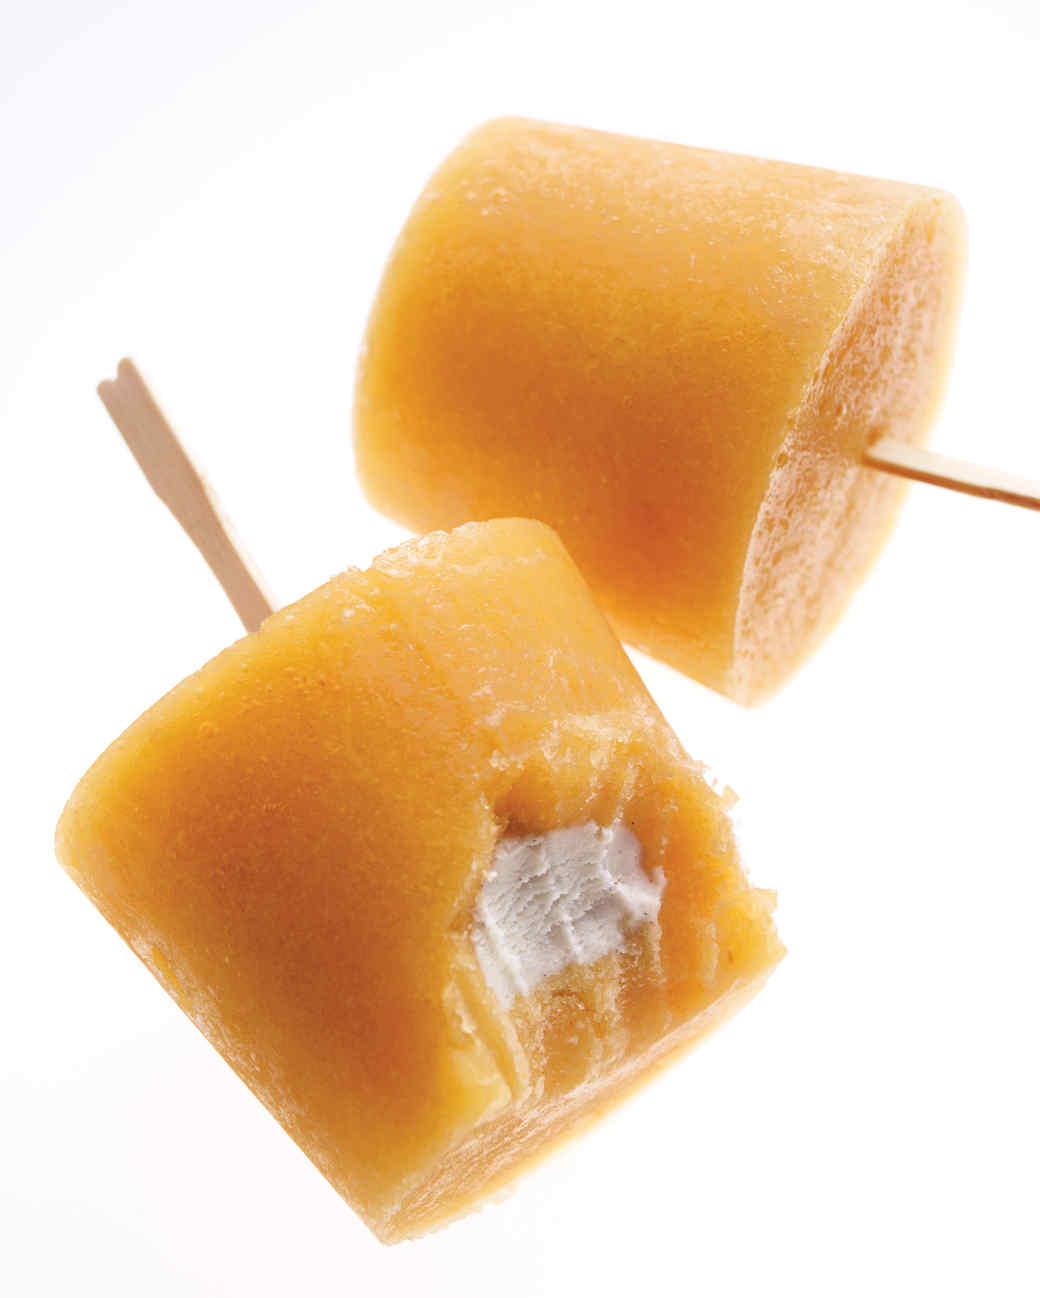 peaches-n-cream-ice-pops-d107281-0615.jpg